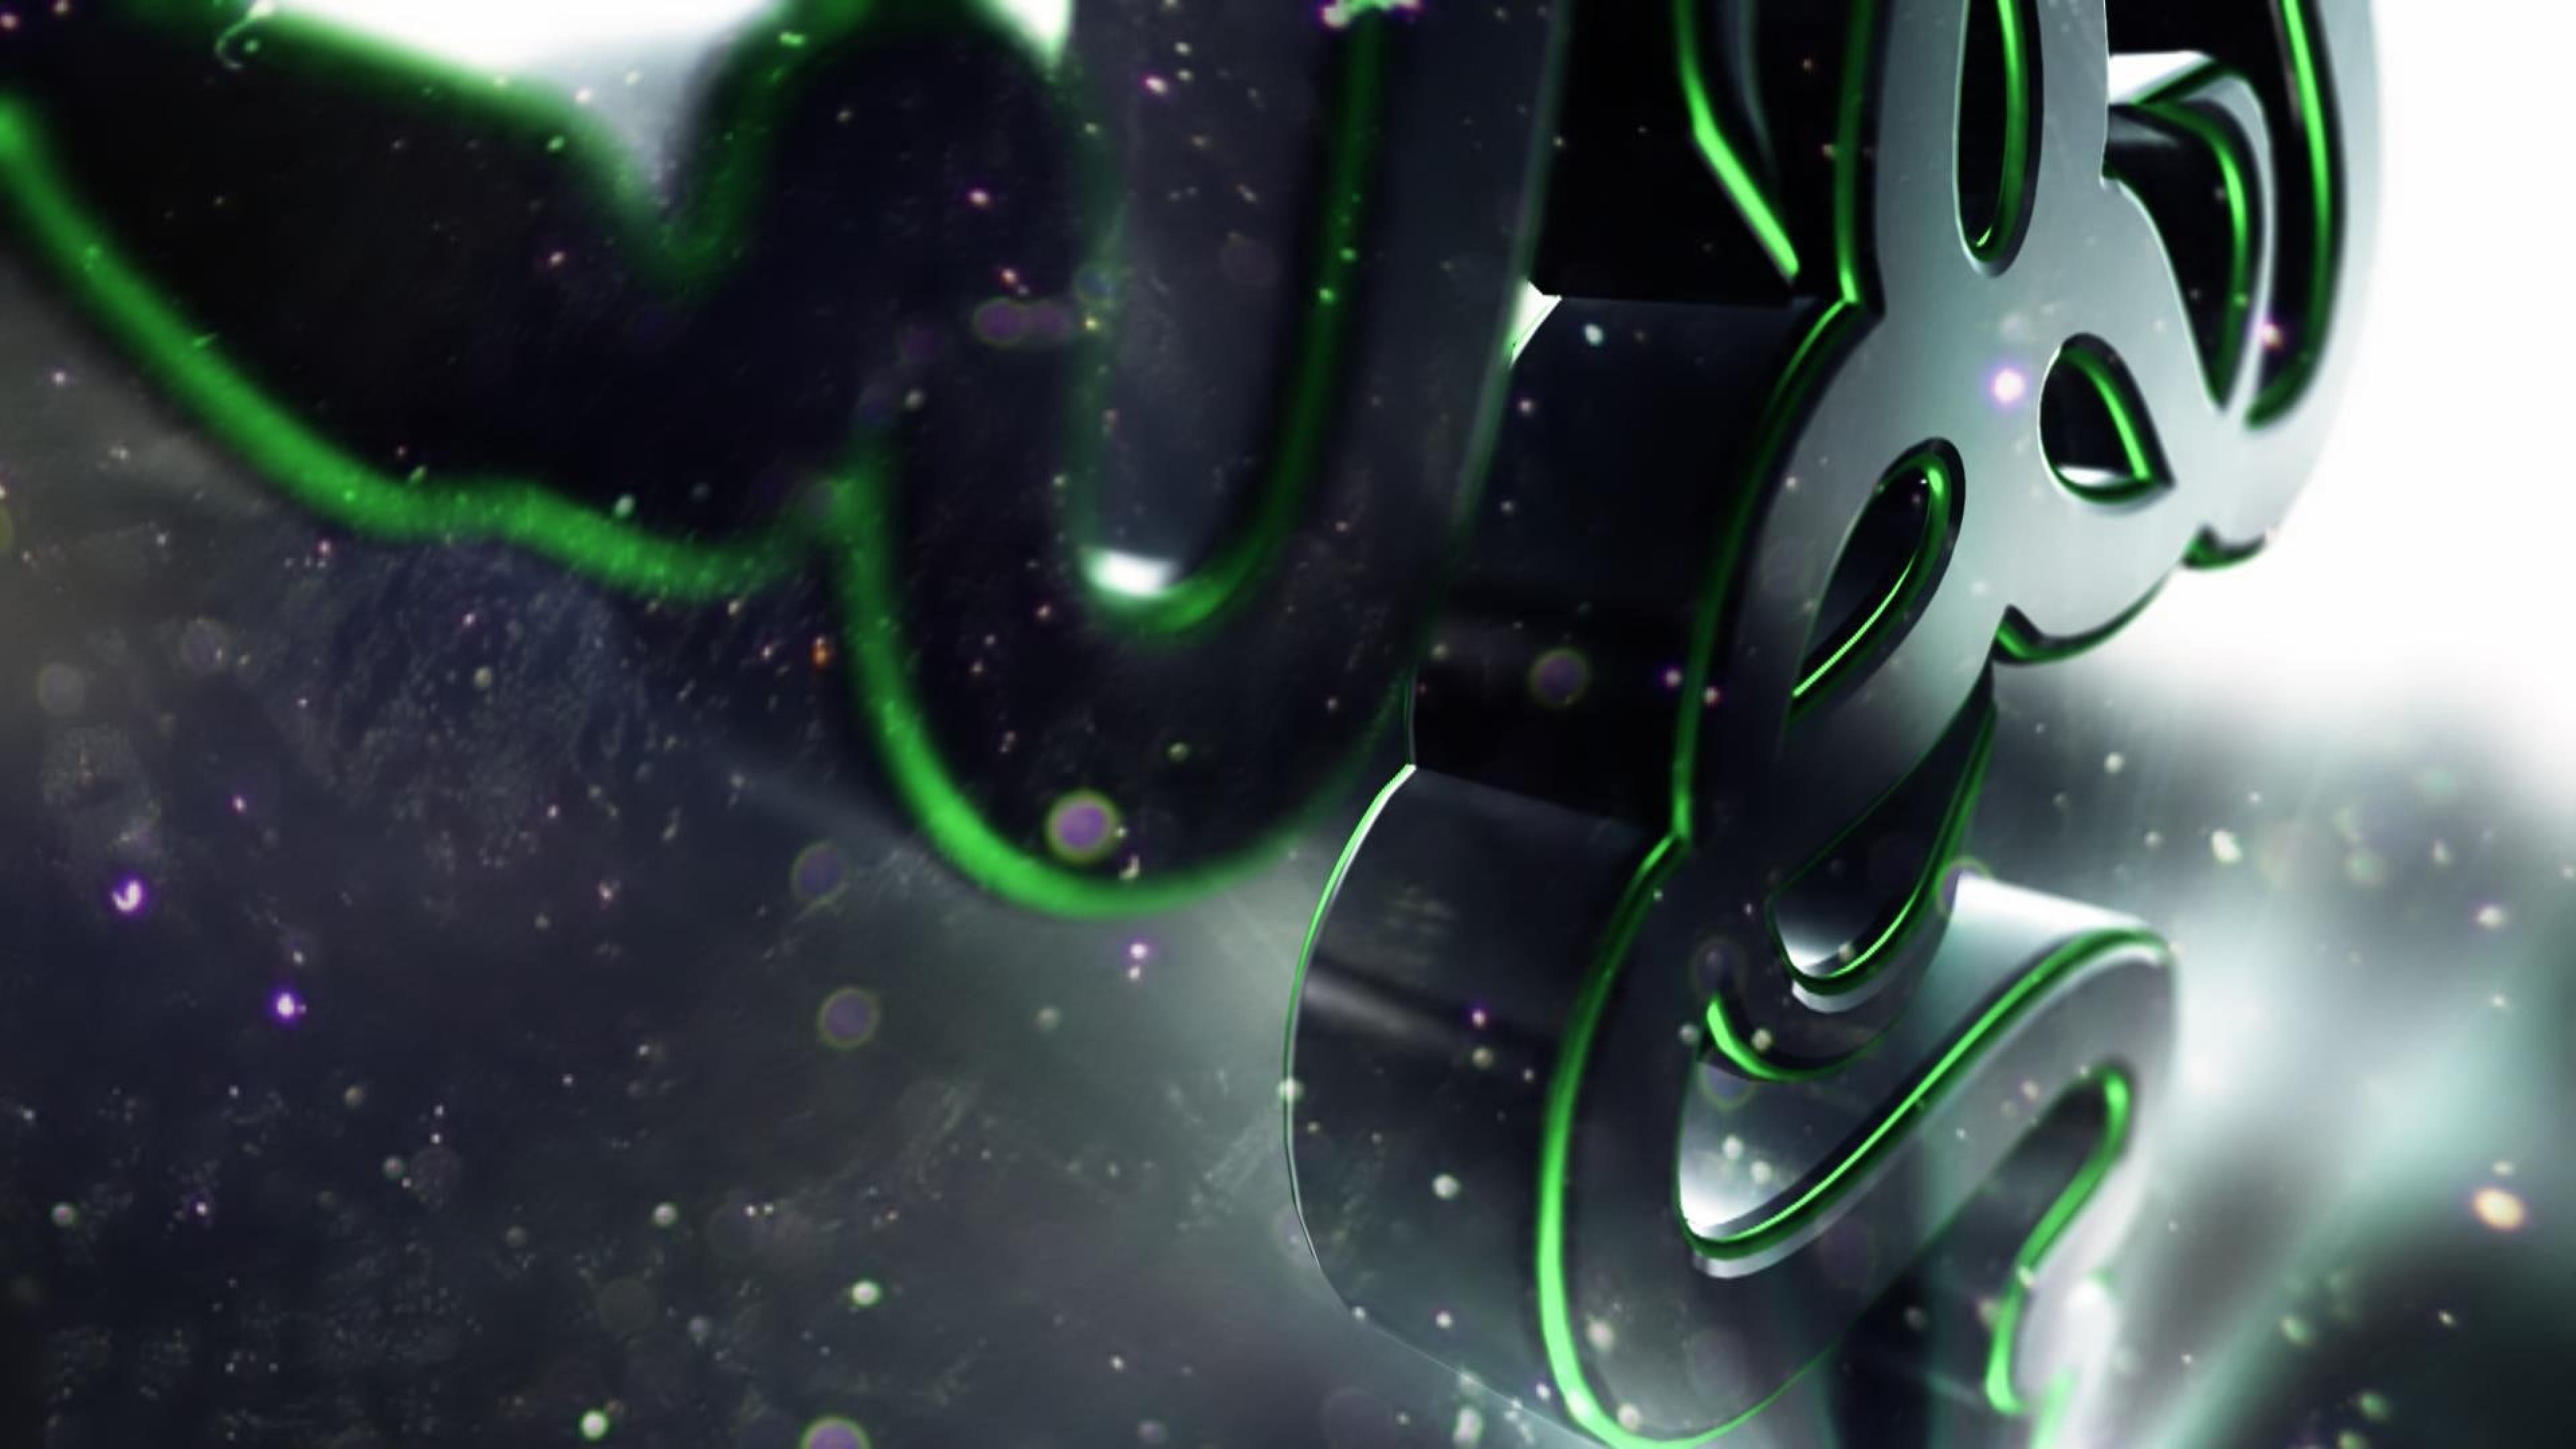 3840x2160 Razer Logo Symbol Shape Wallpaper Background 4K Ultra HD 3840x2160